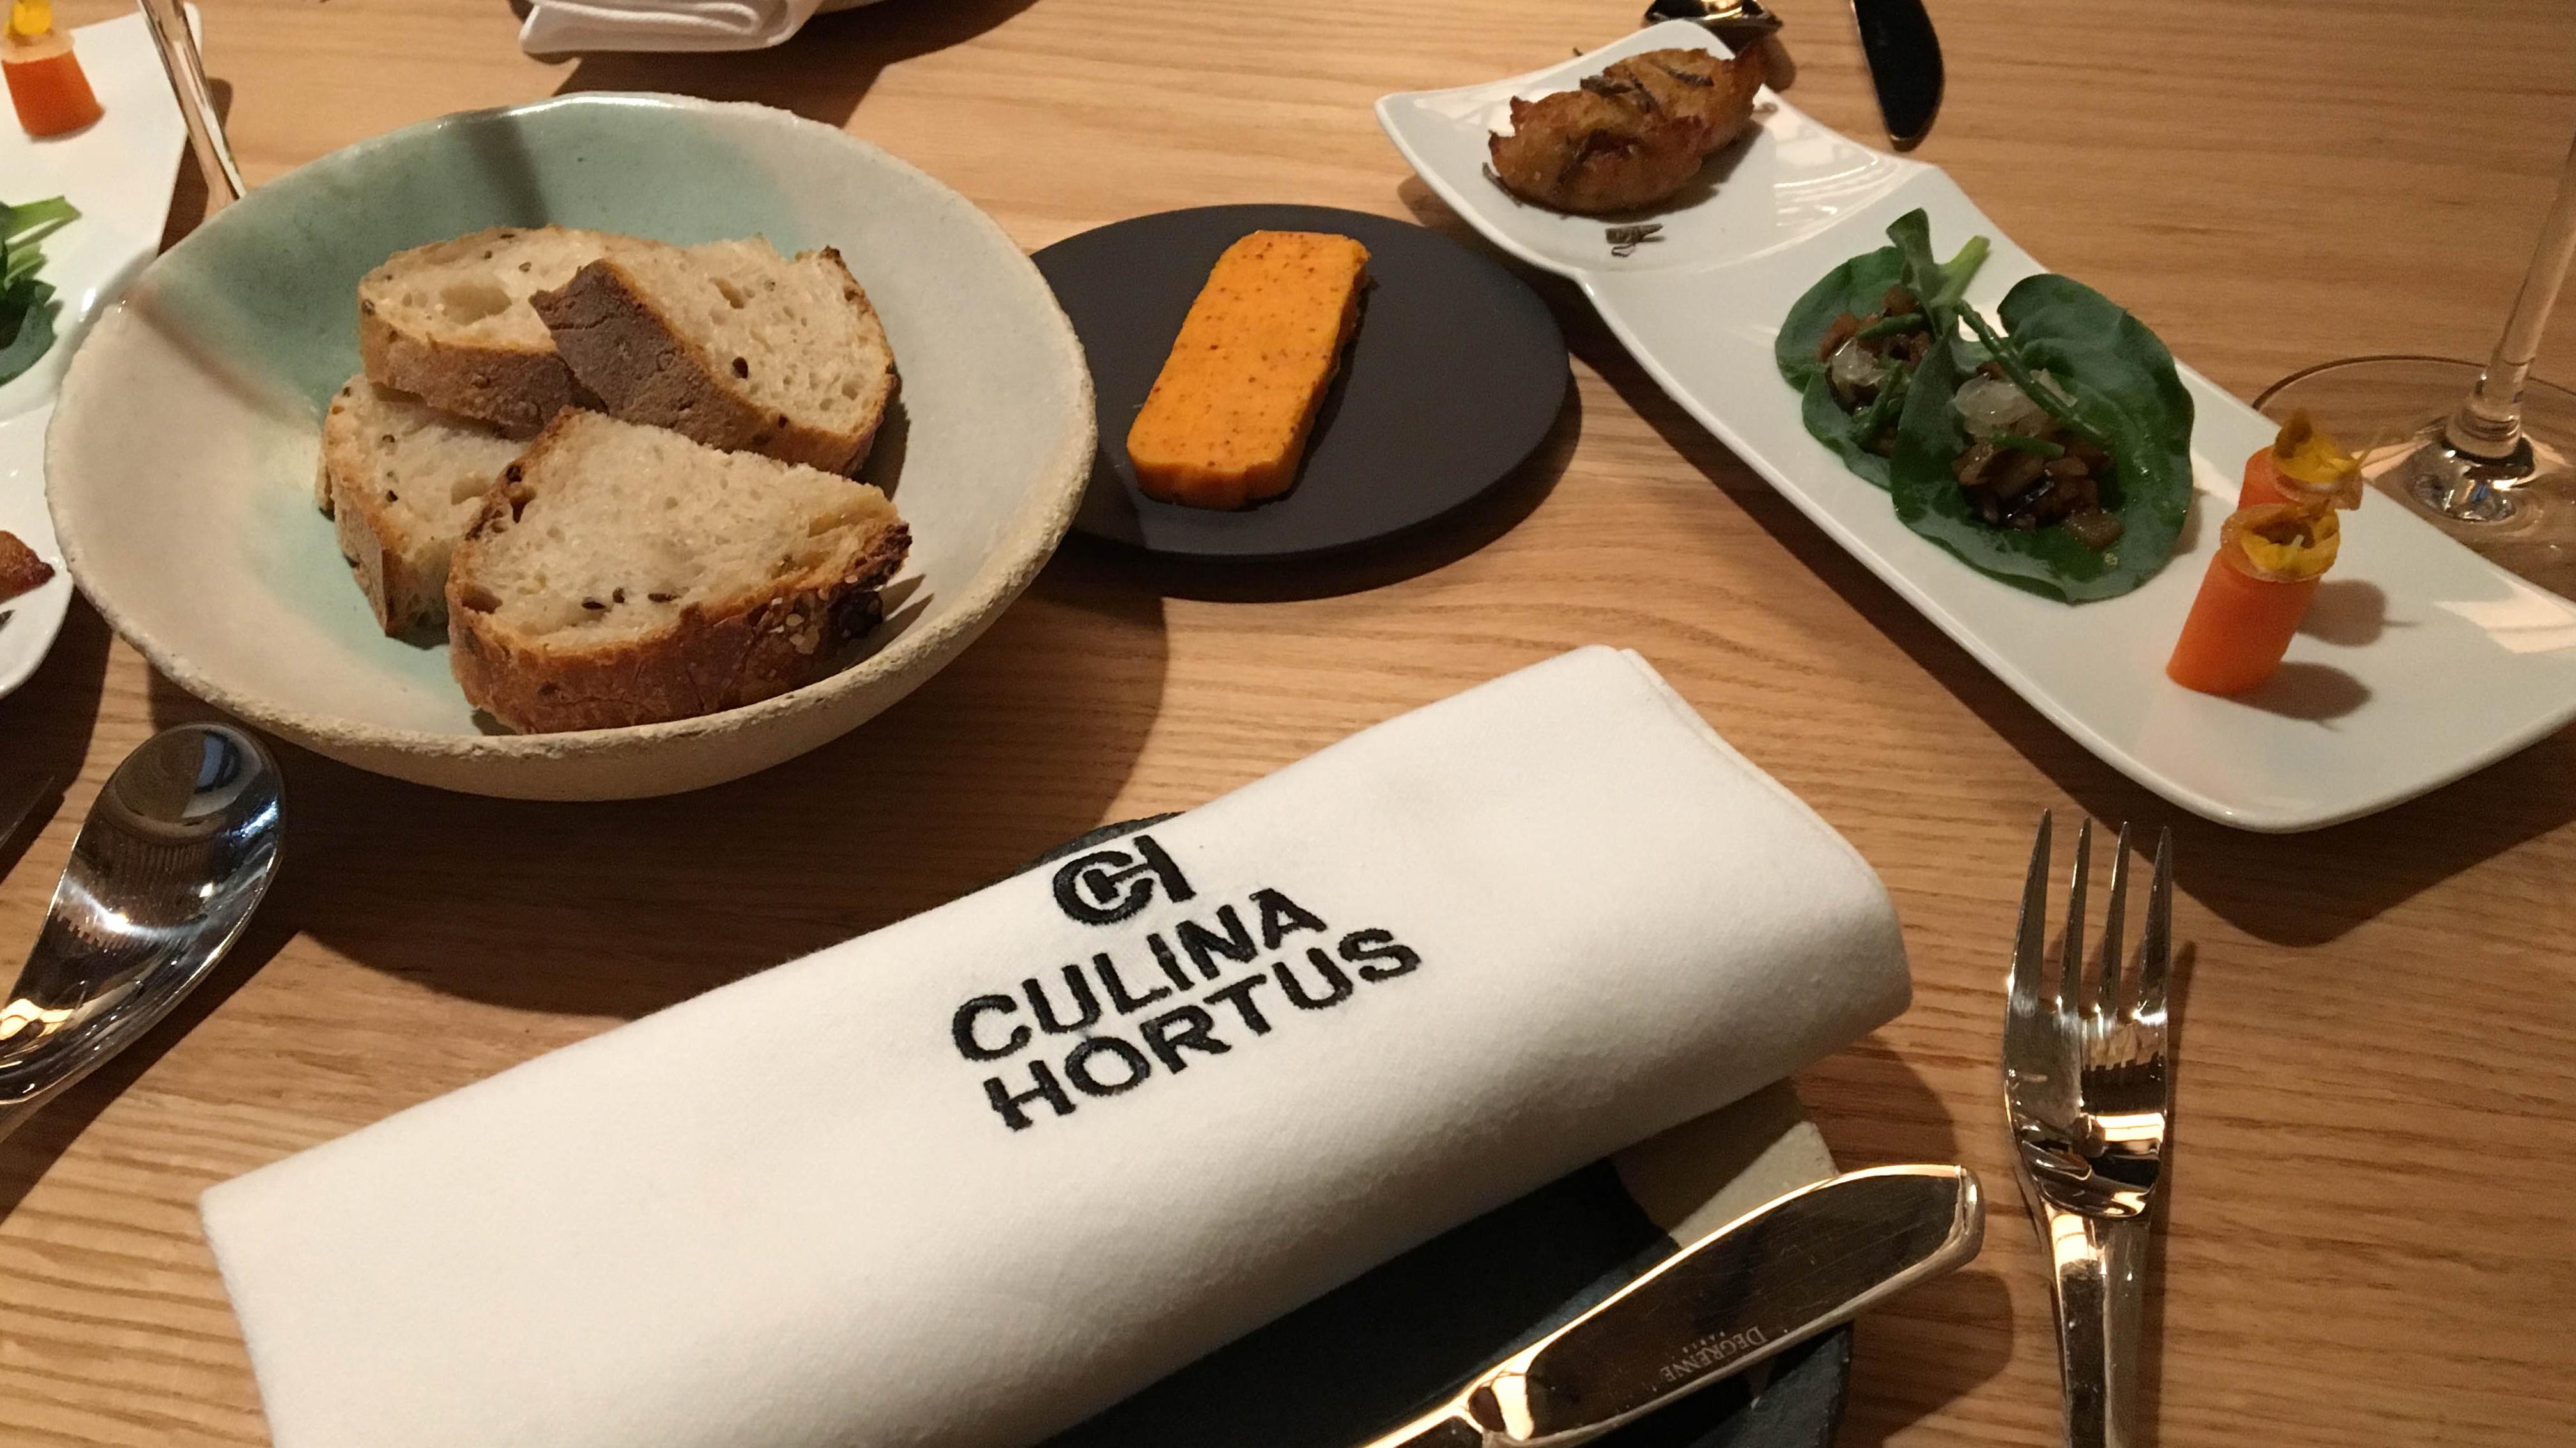 Culina Hortus - Amuse Bouche